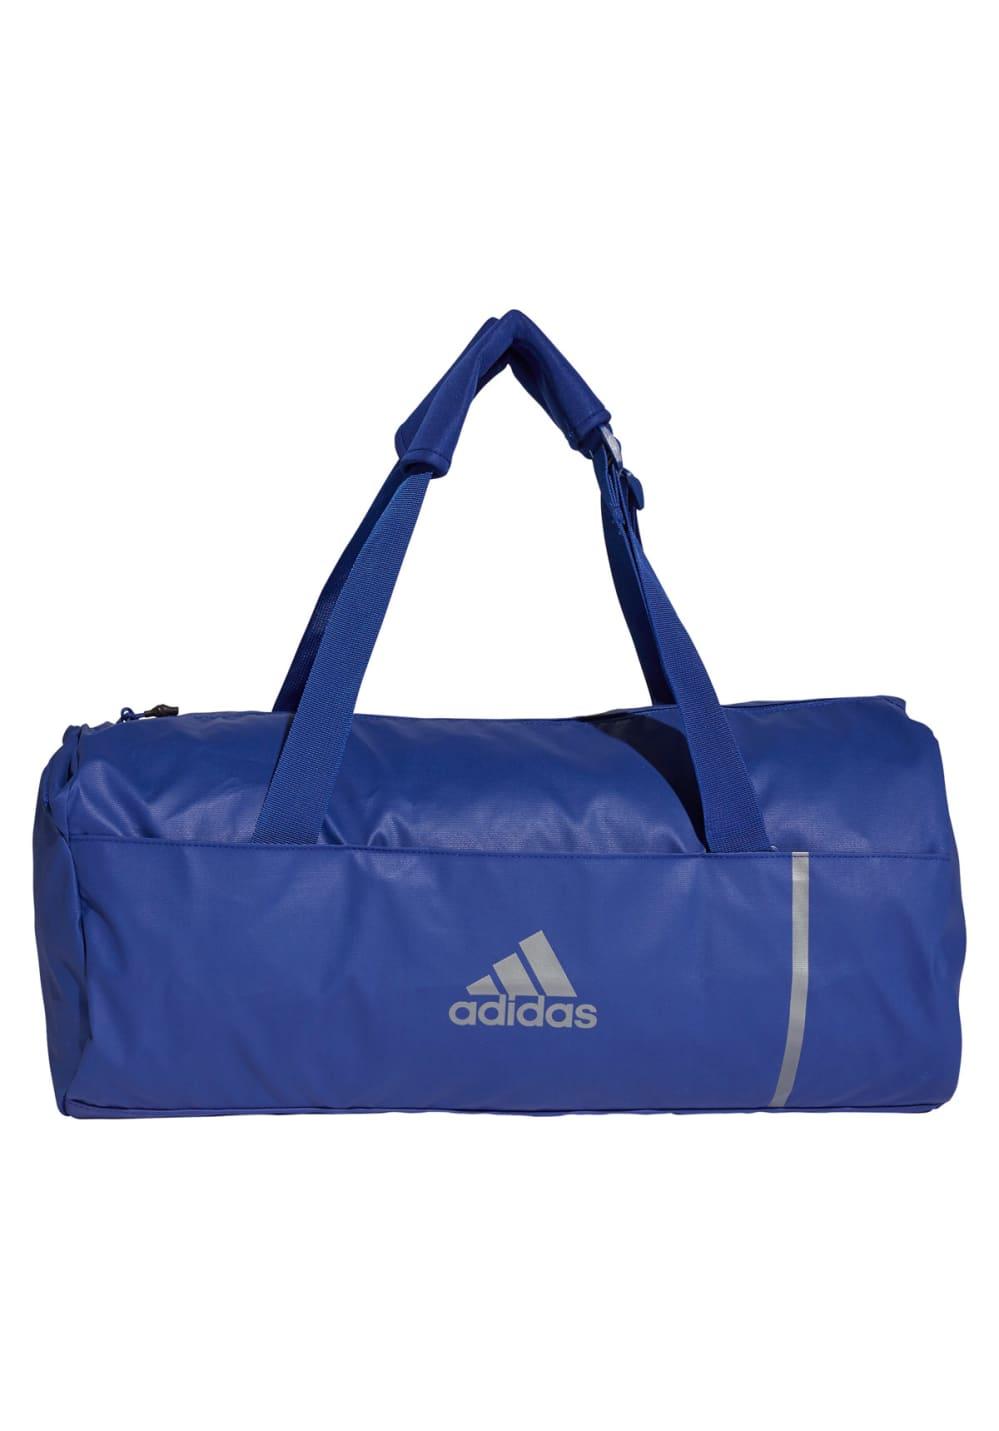 adidas Convertible Training Duffel Bag Medium Sporttaschen - Blau, Gr. M